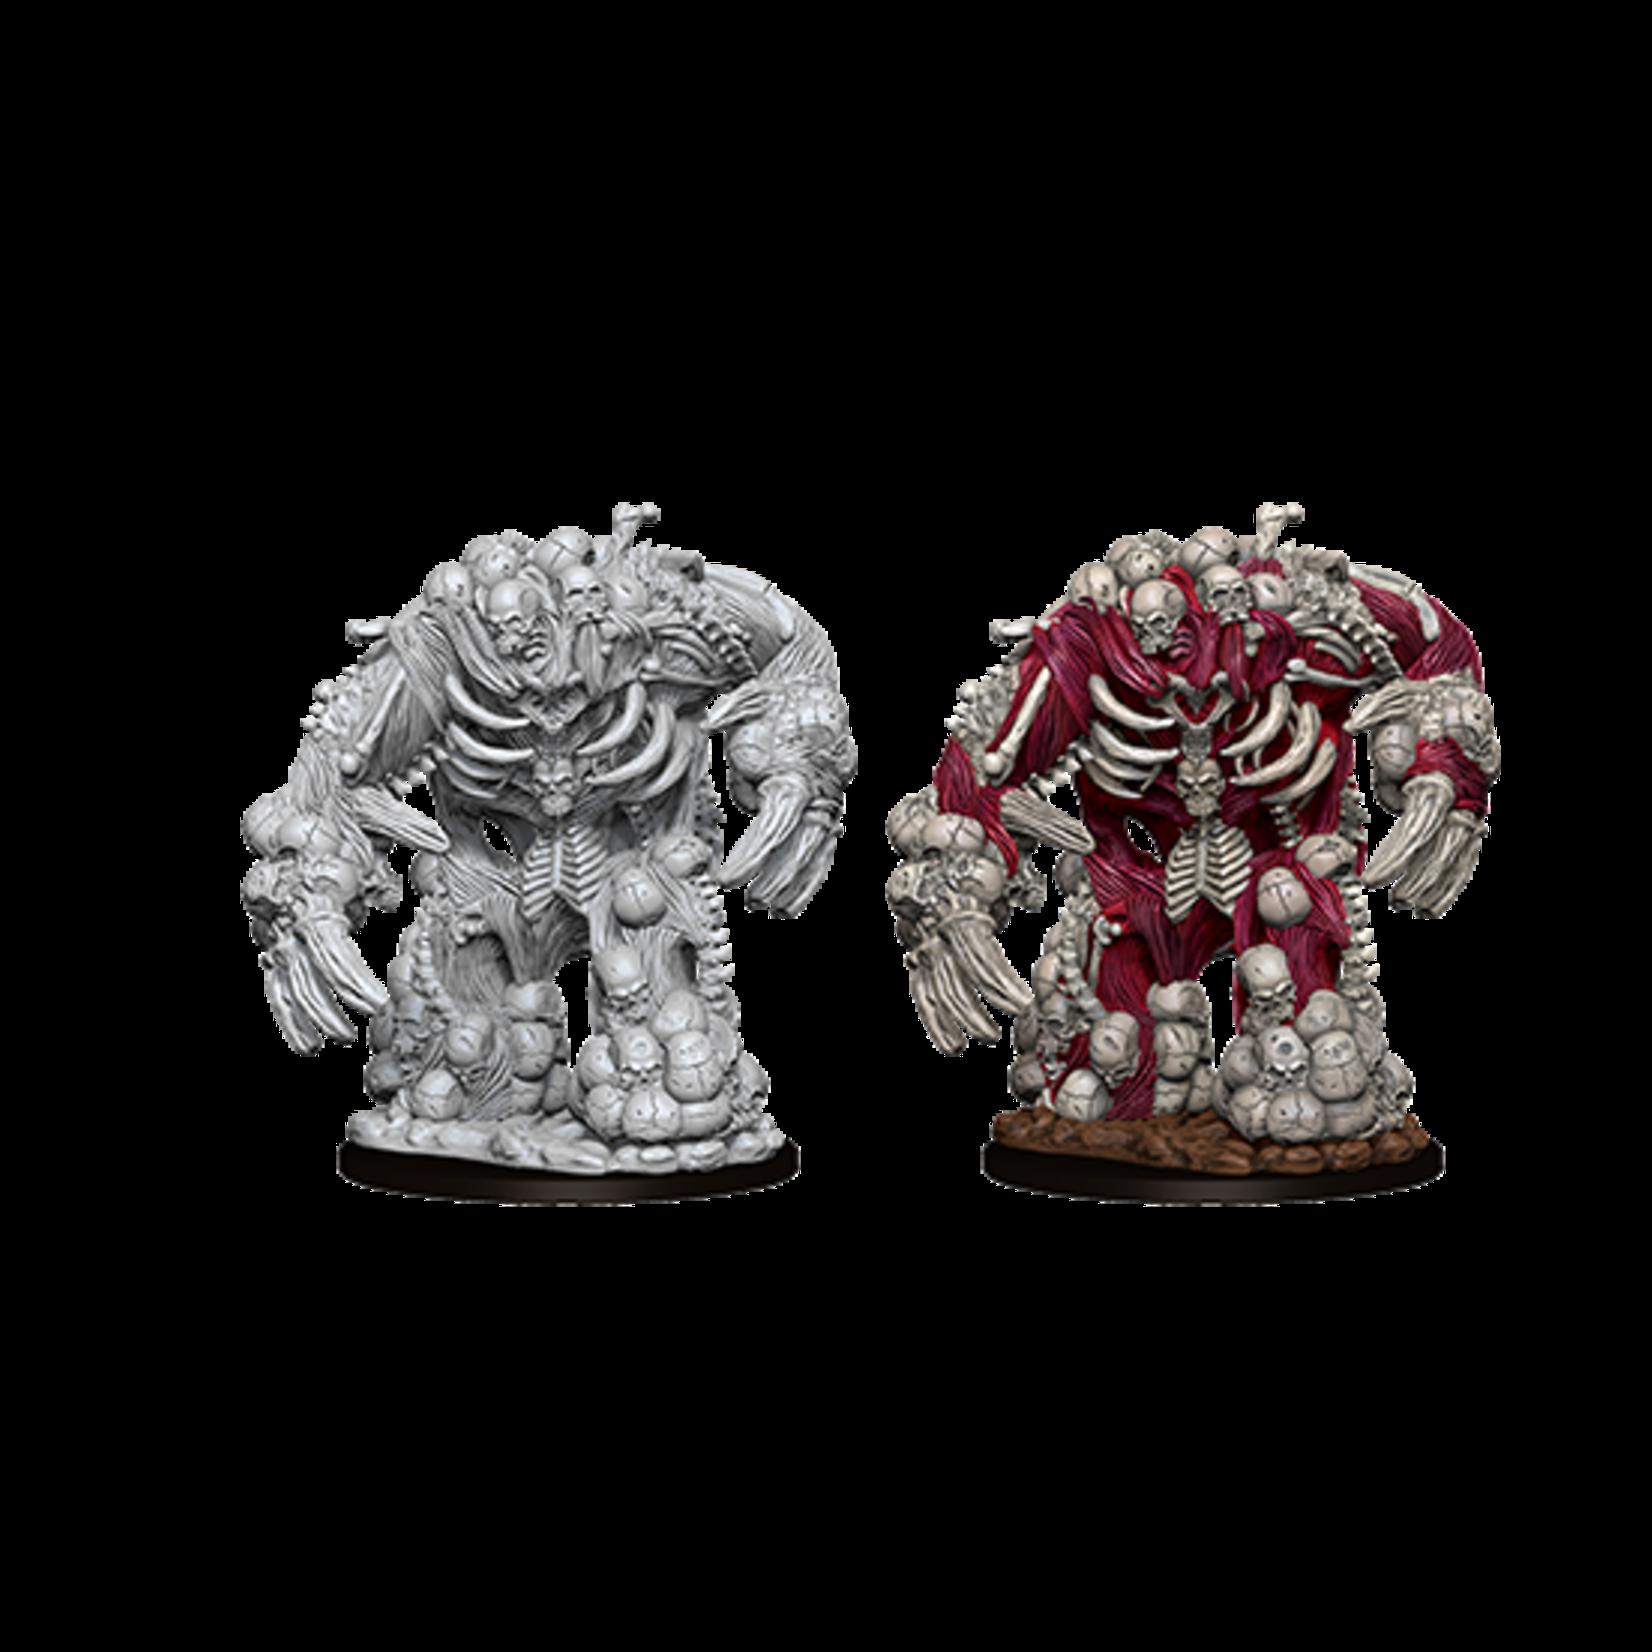 WizKids Wizkids Pathfinder Deep Cuts Miniatures: Bone Golem (W12)